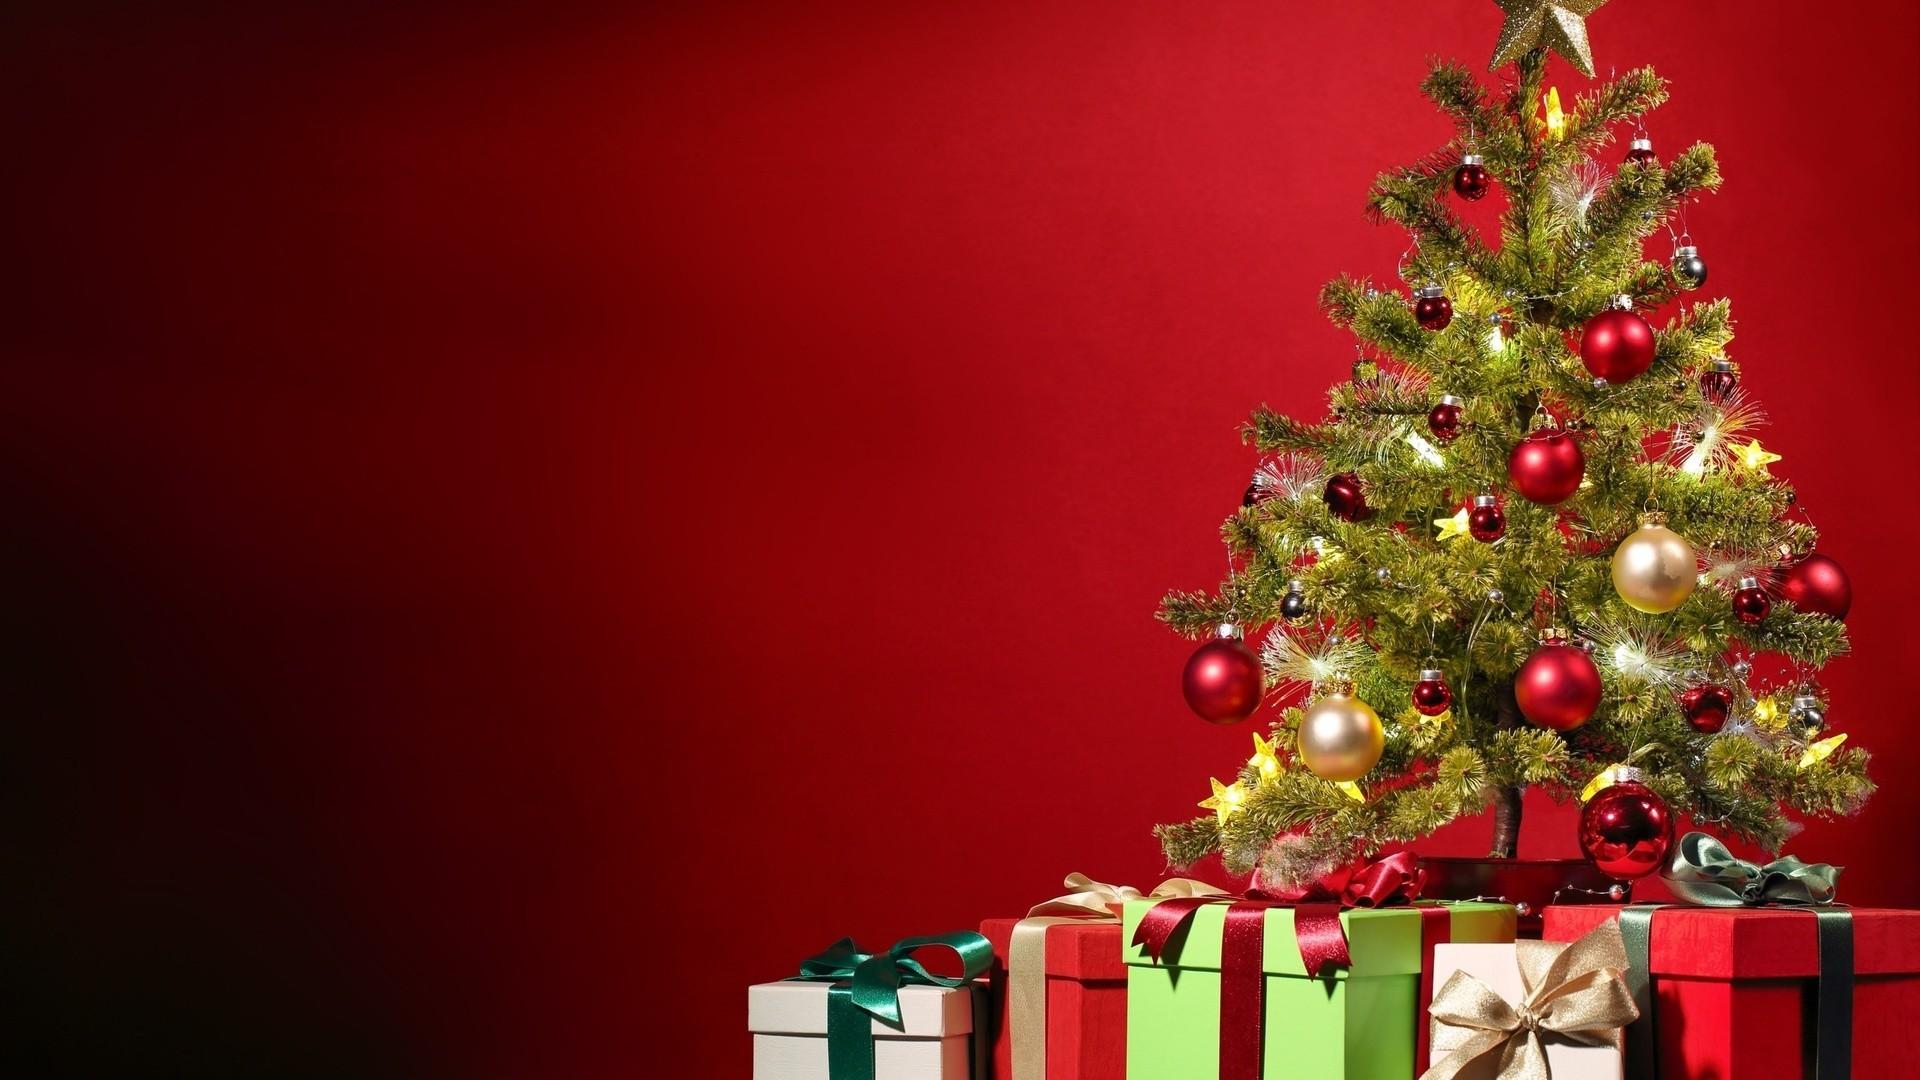 Christmas Background Image ·â'